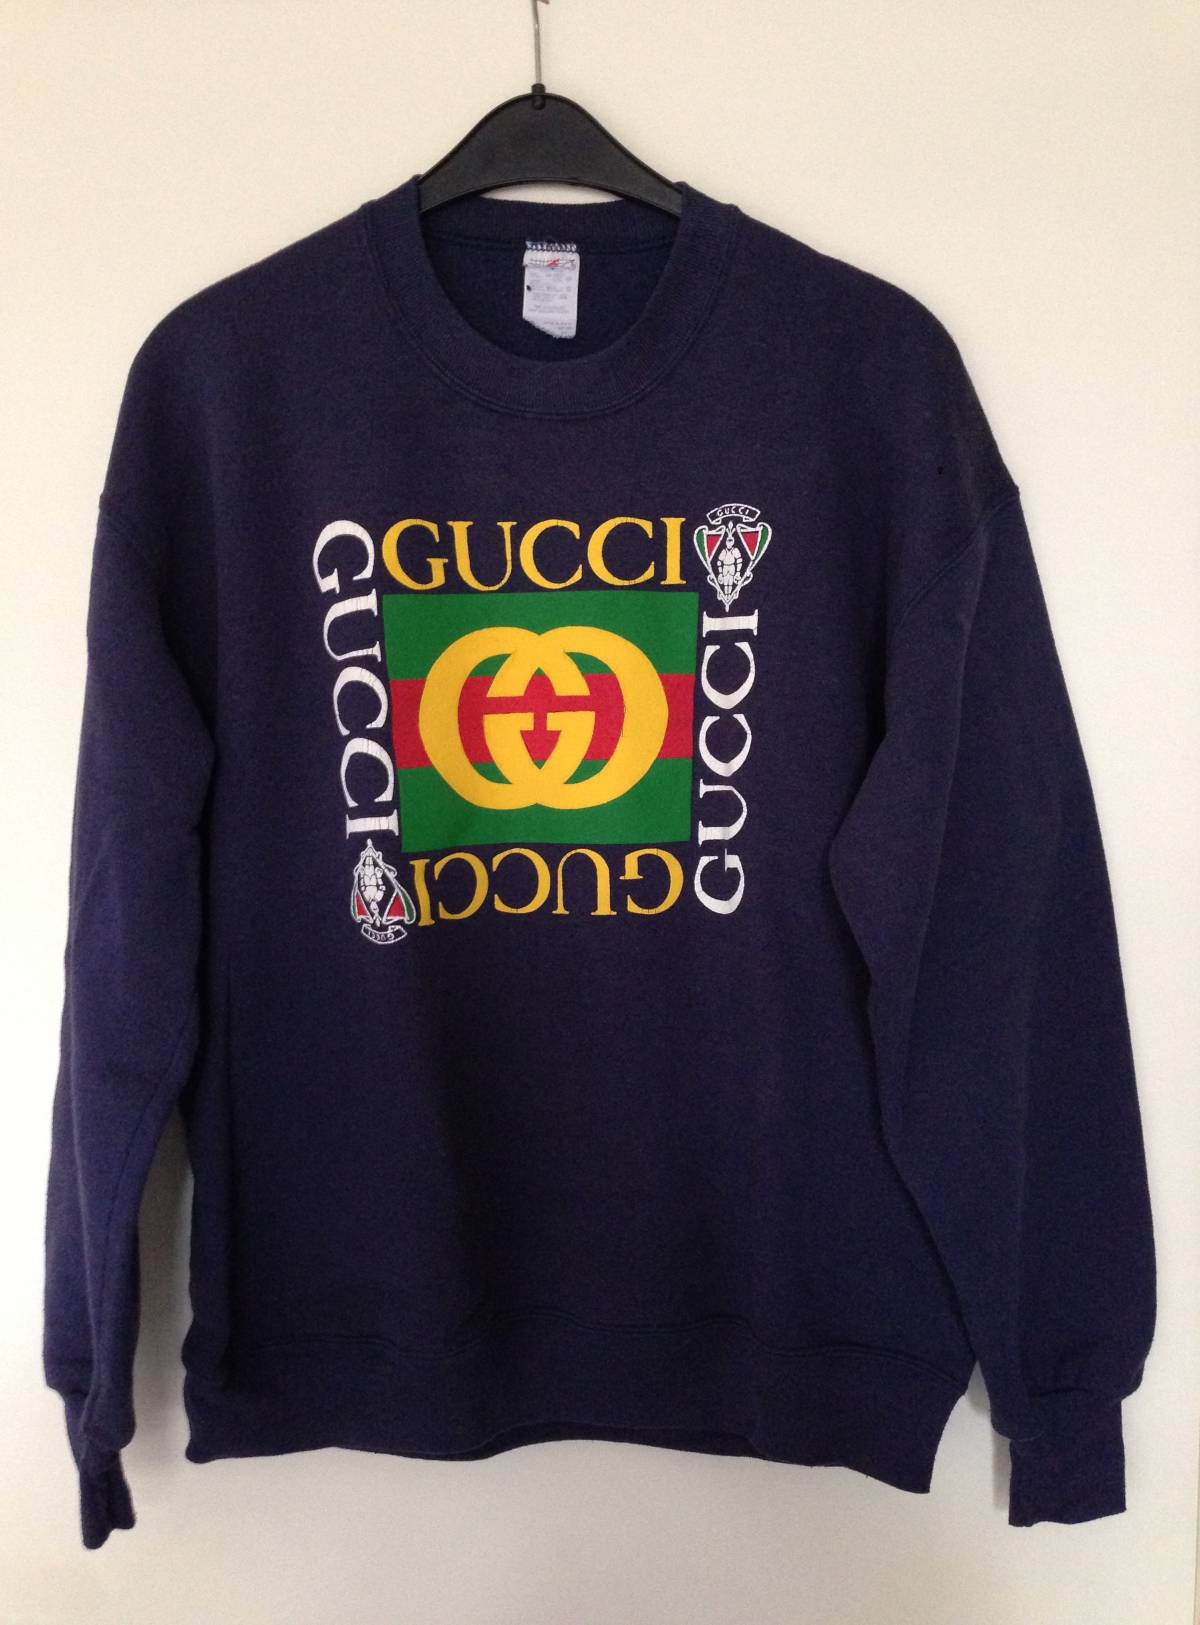 0f5d1c1c5ea Gucci Vintage Bootleg Gucci Sweatshirt